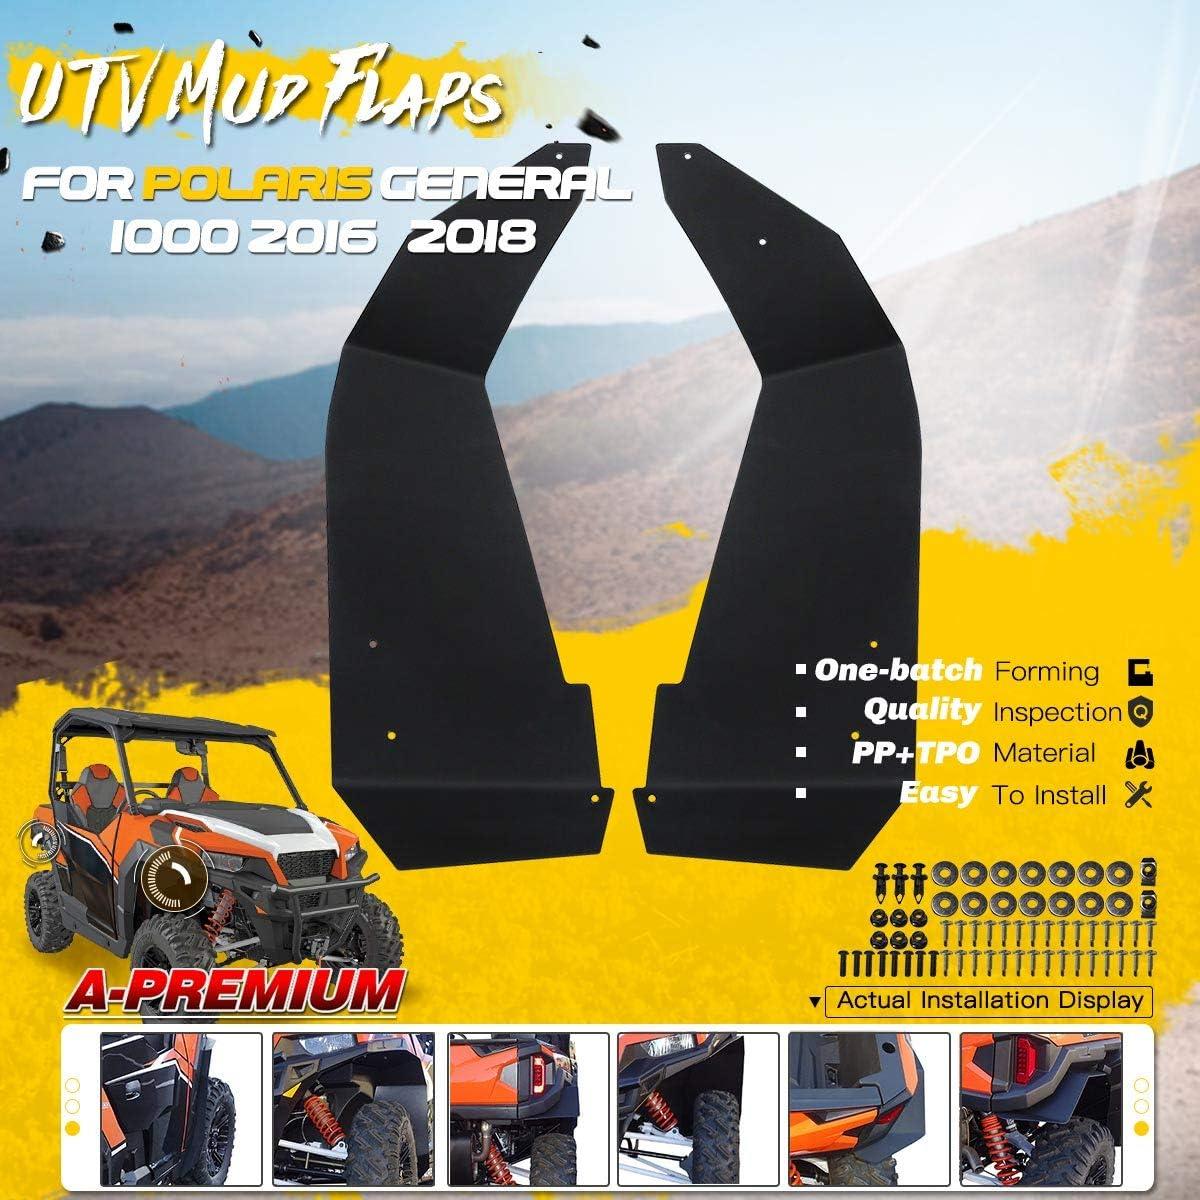 A-Premium UTV Mud Flaps Fender Flares Replacement for Polaris General 1000 2016-2019 General 4 1000 2017-2019 Front Side 2-PC Set